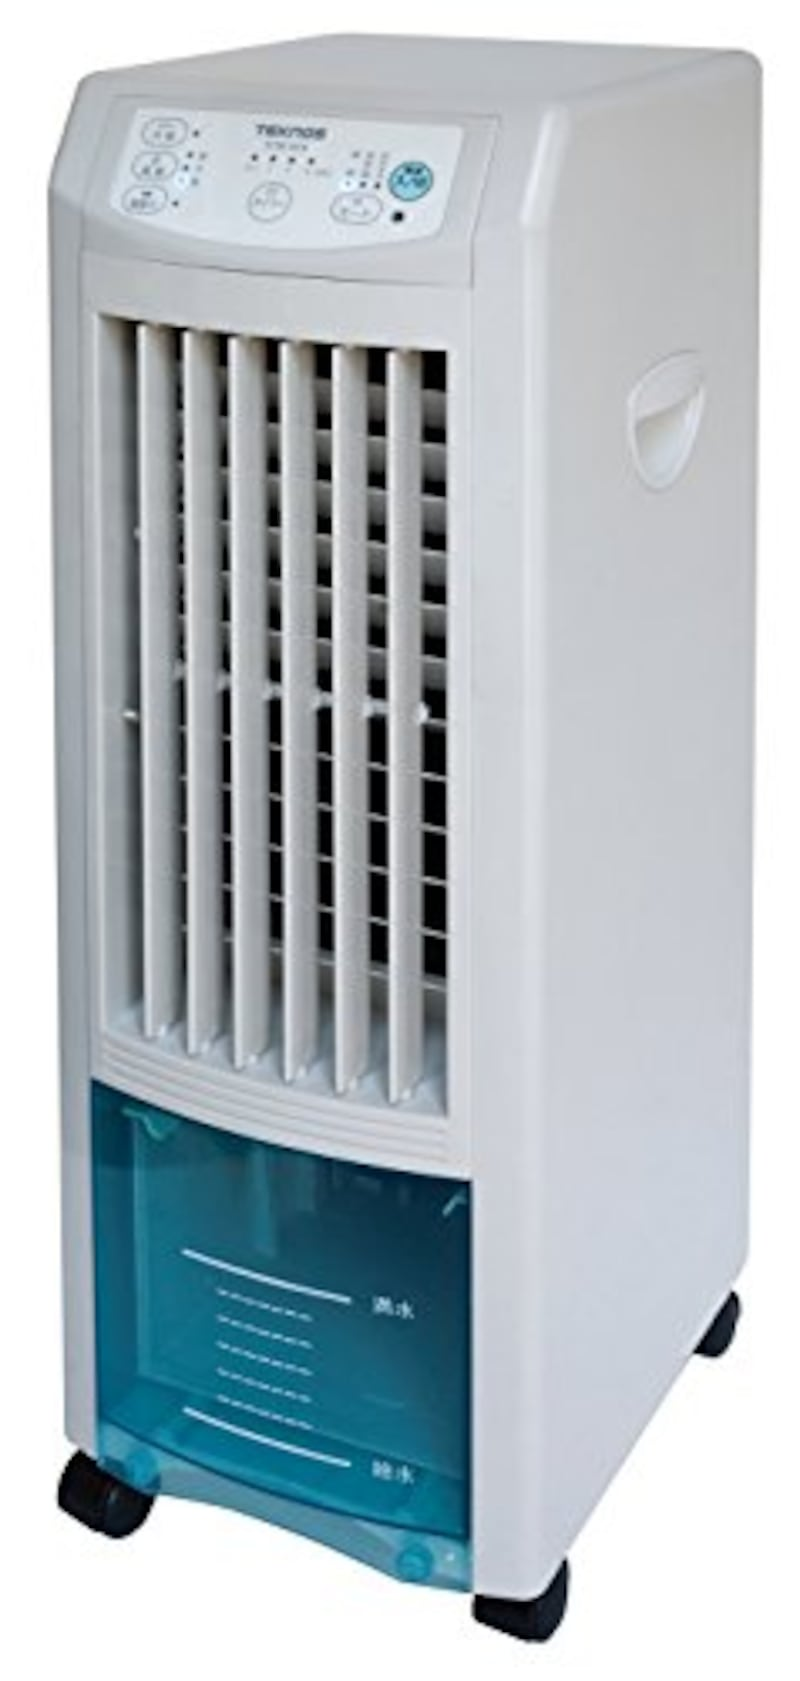 TEKNOS(テクノス),冷風扇 スリムタイプ,TCW-010